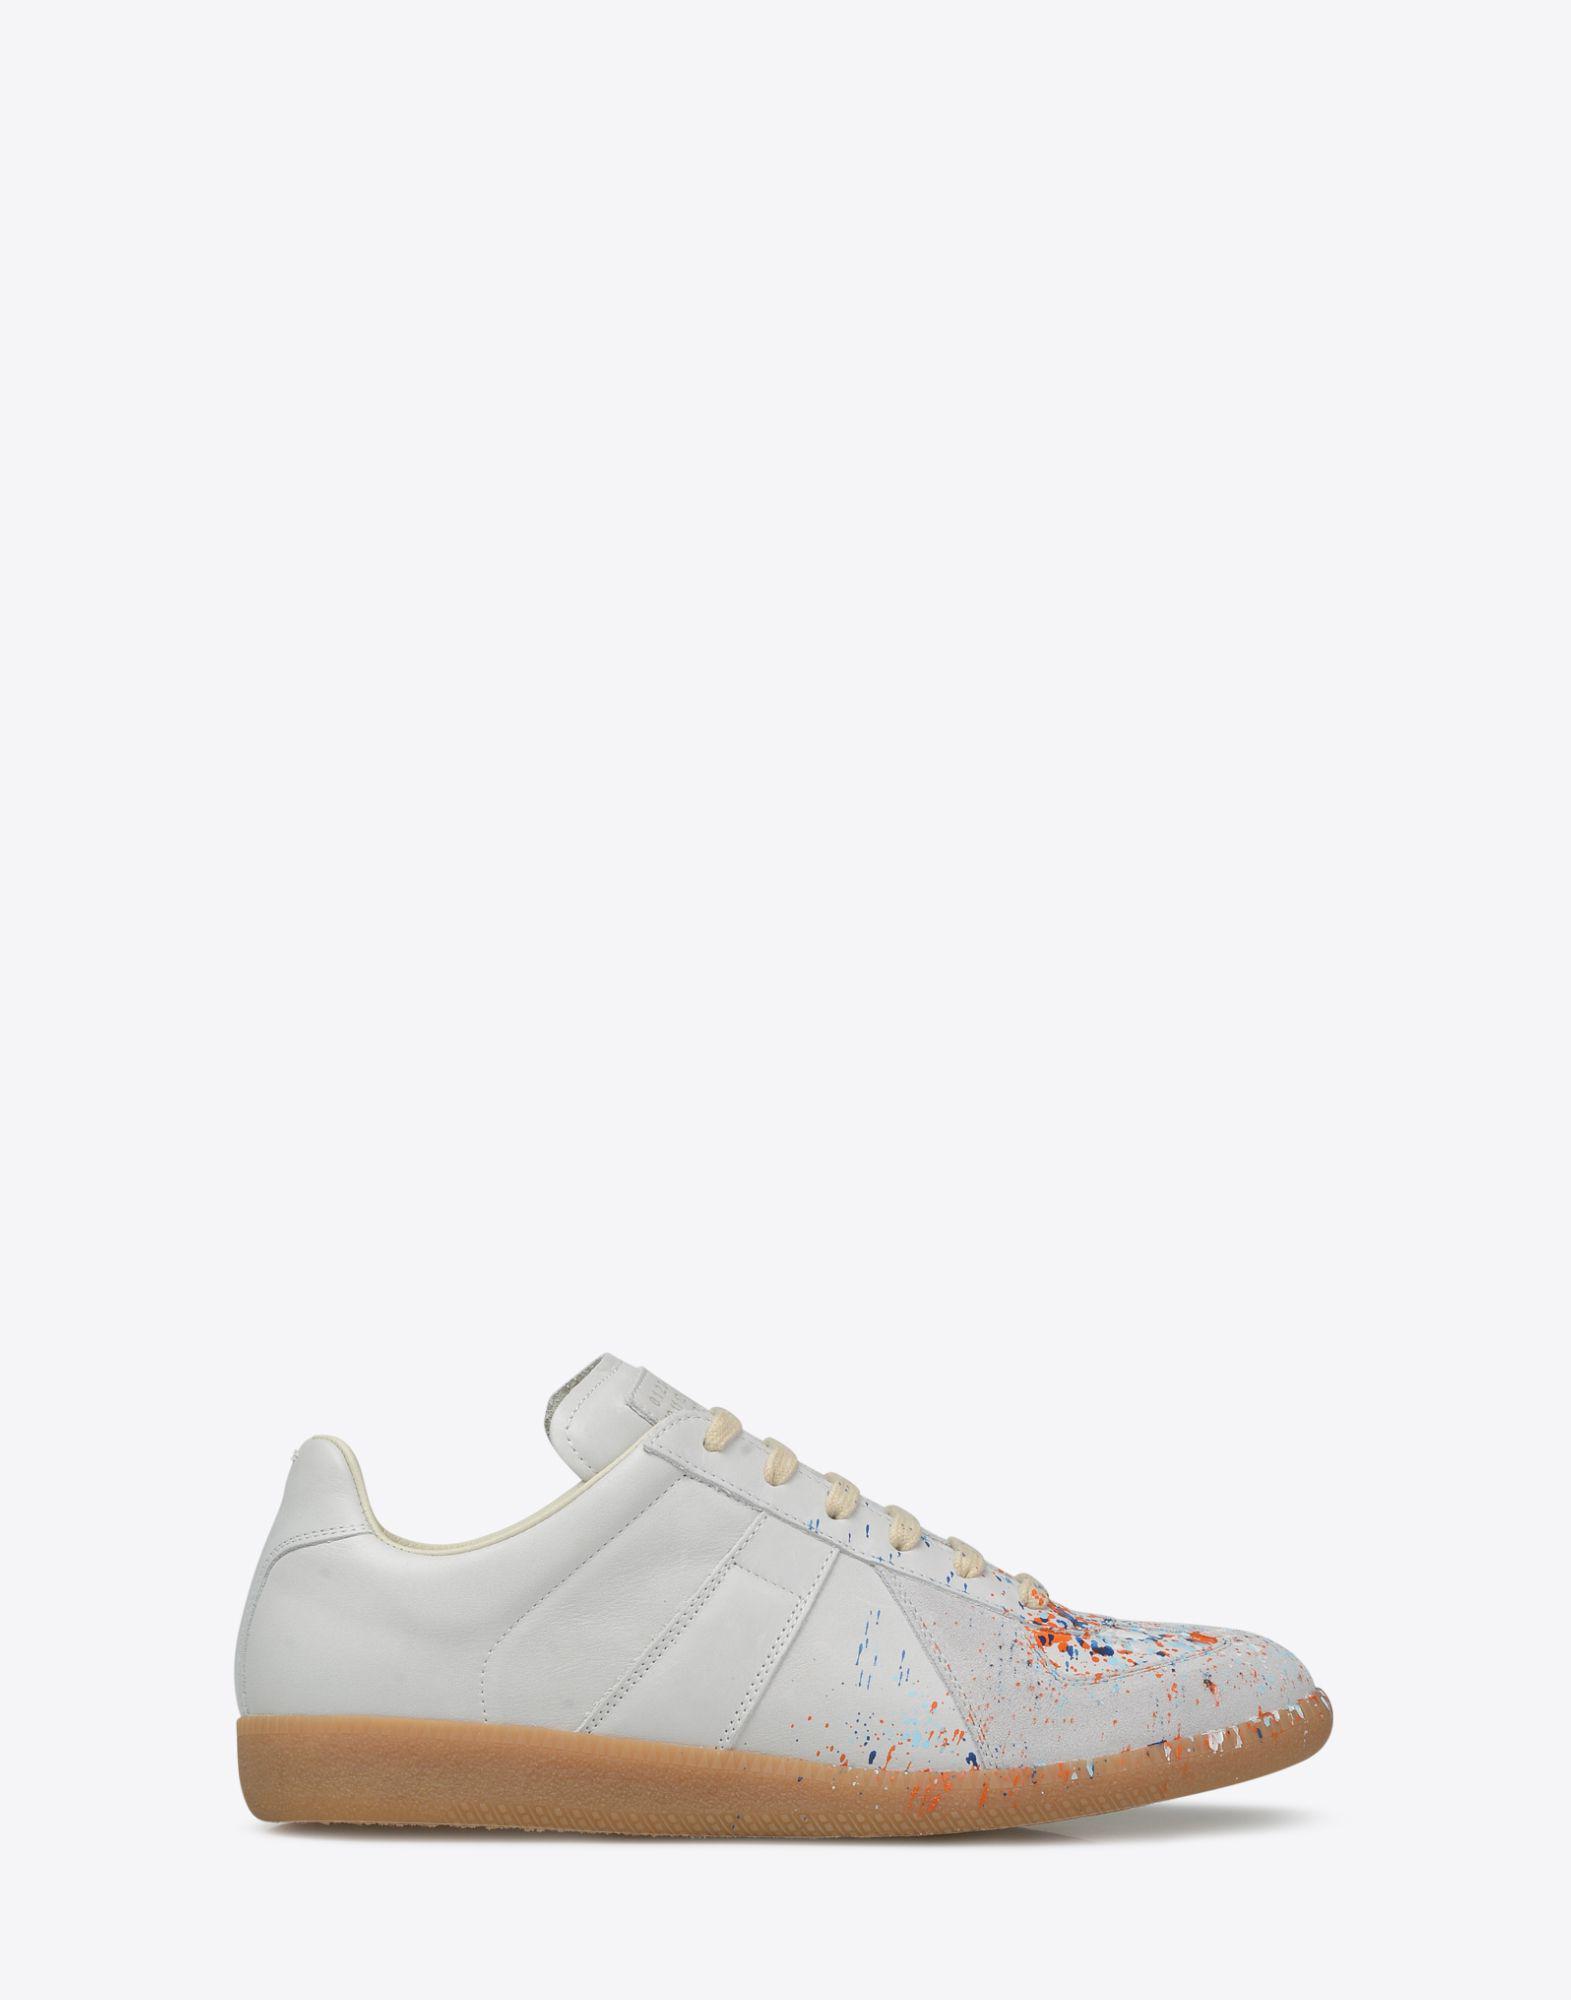 cad1a982ae98 Lyst - Maison Margiela Replica Paint-Splatter Sneakers in Gray for Men